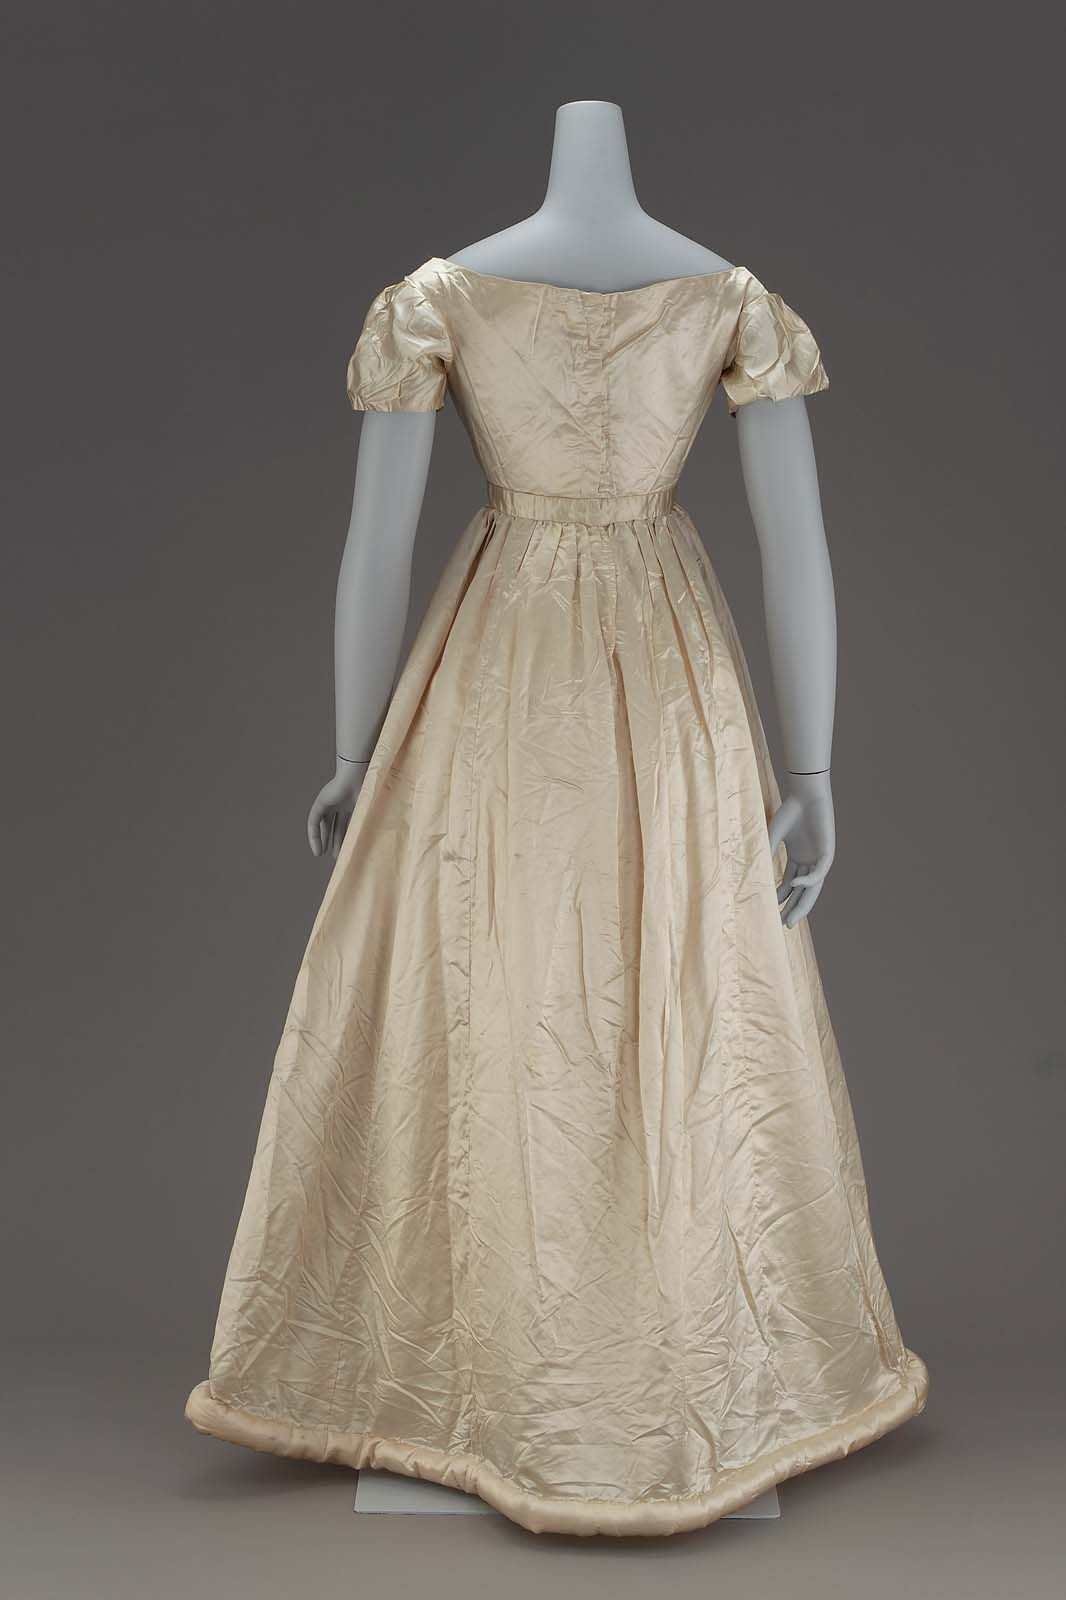 c.1817 Dress, English or American: Silk satin, cotton plain weave, wool batting, metal hook and eye closures (view 2)